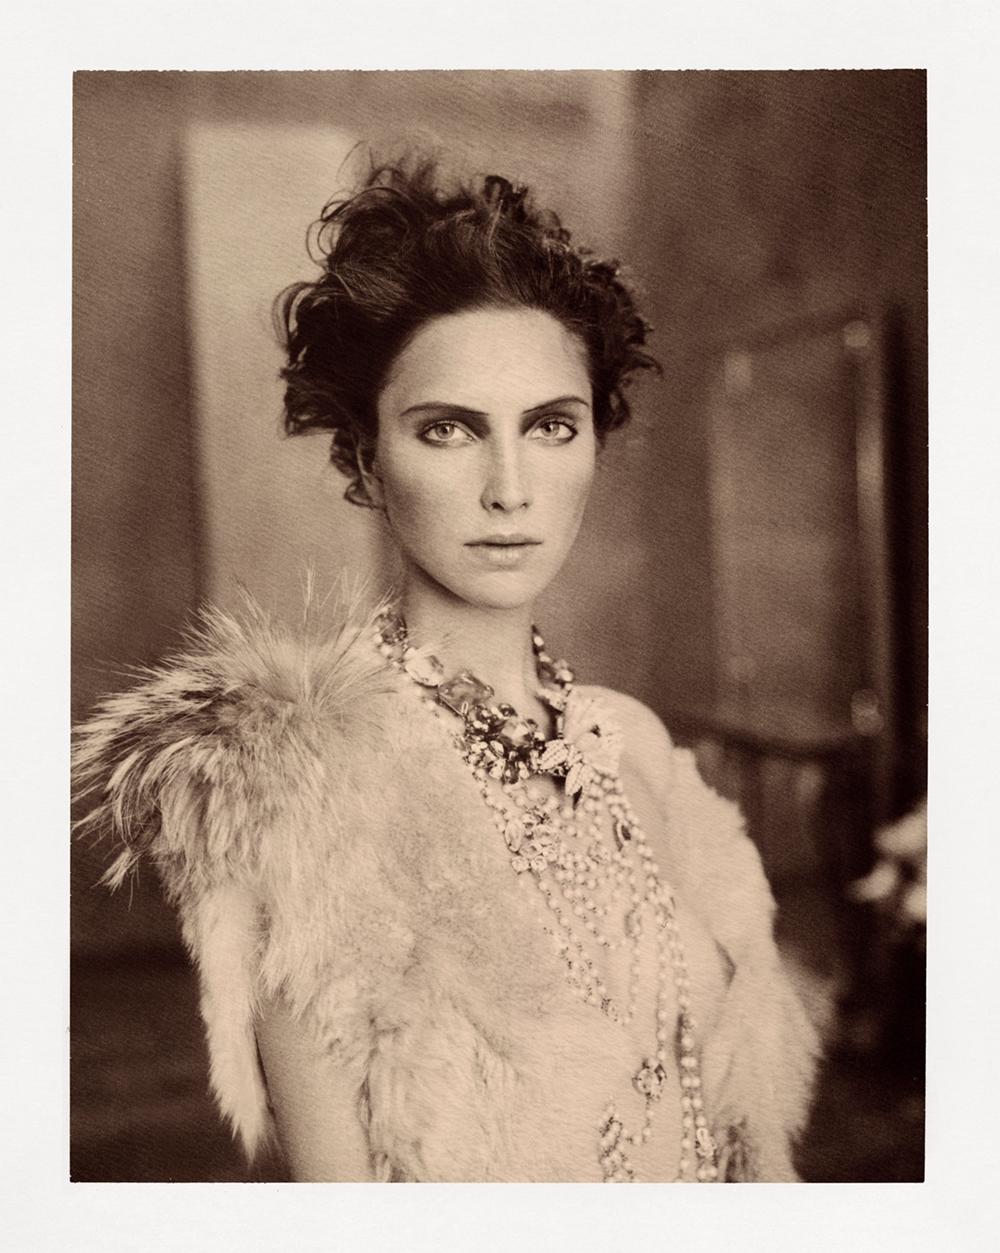 polaroidfoto van Marc Lagrange uit boek Chocolate, portret van vrouw getiteld Valerie